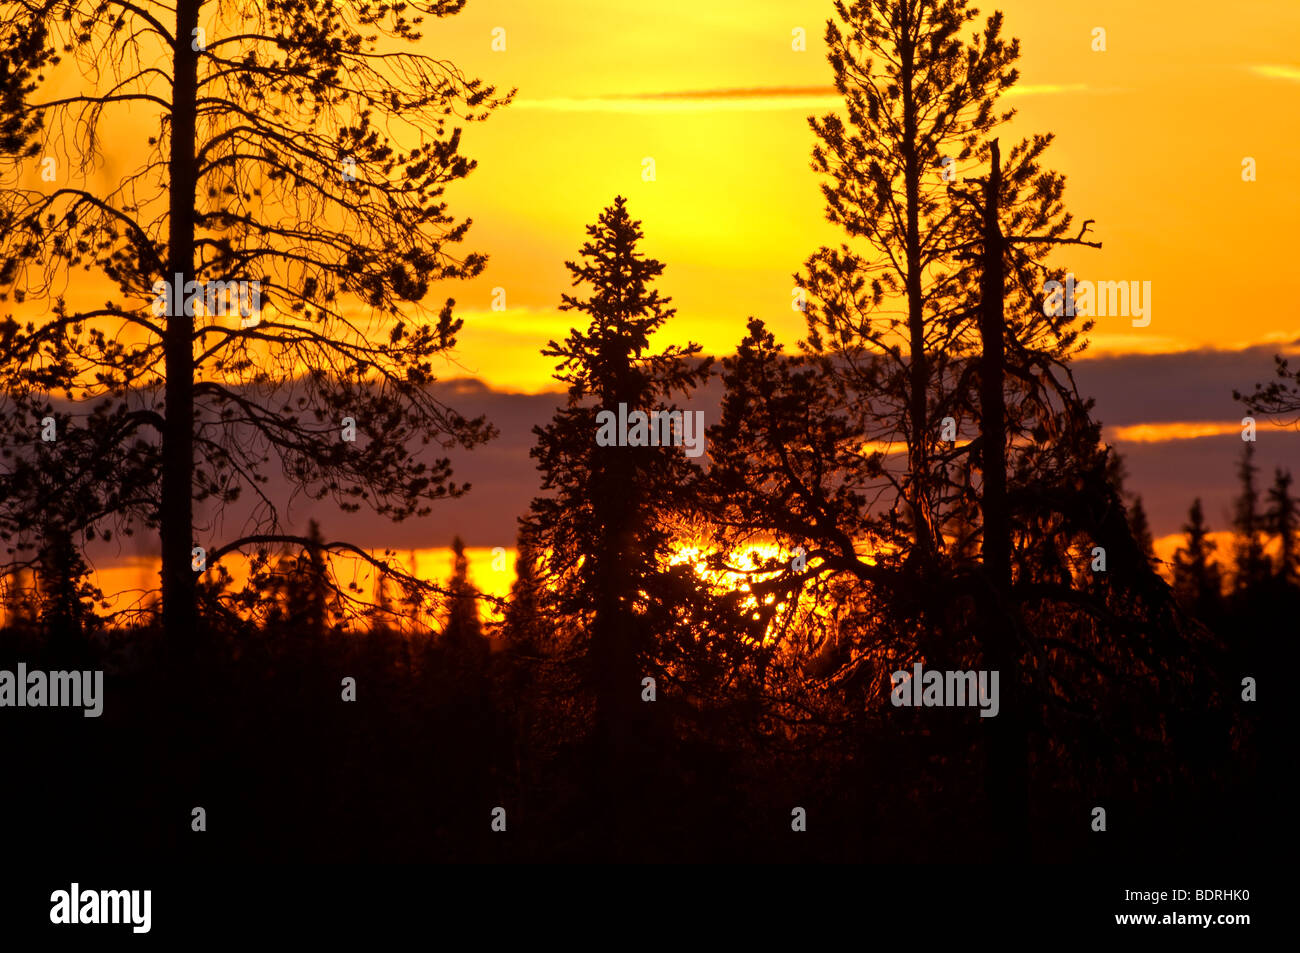 sonnenuntergang im moor, gaellivare, lappland, schweden, sunset at bog in lapland, sweden - Stock Image